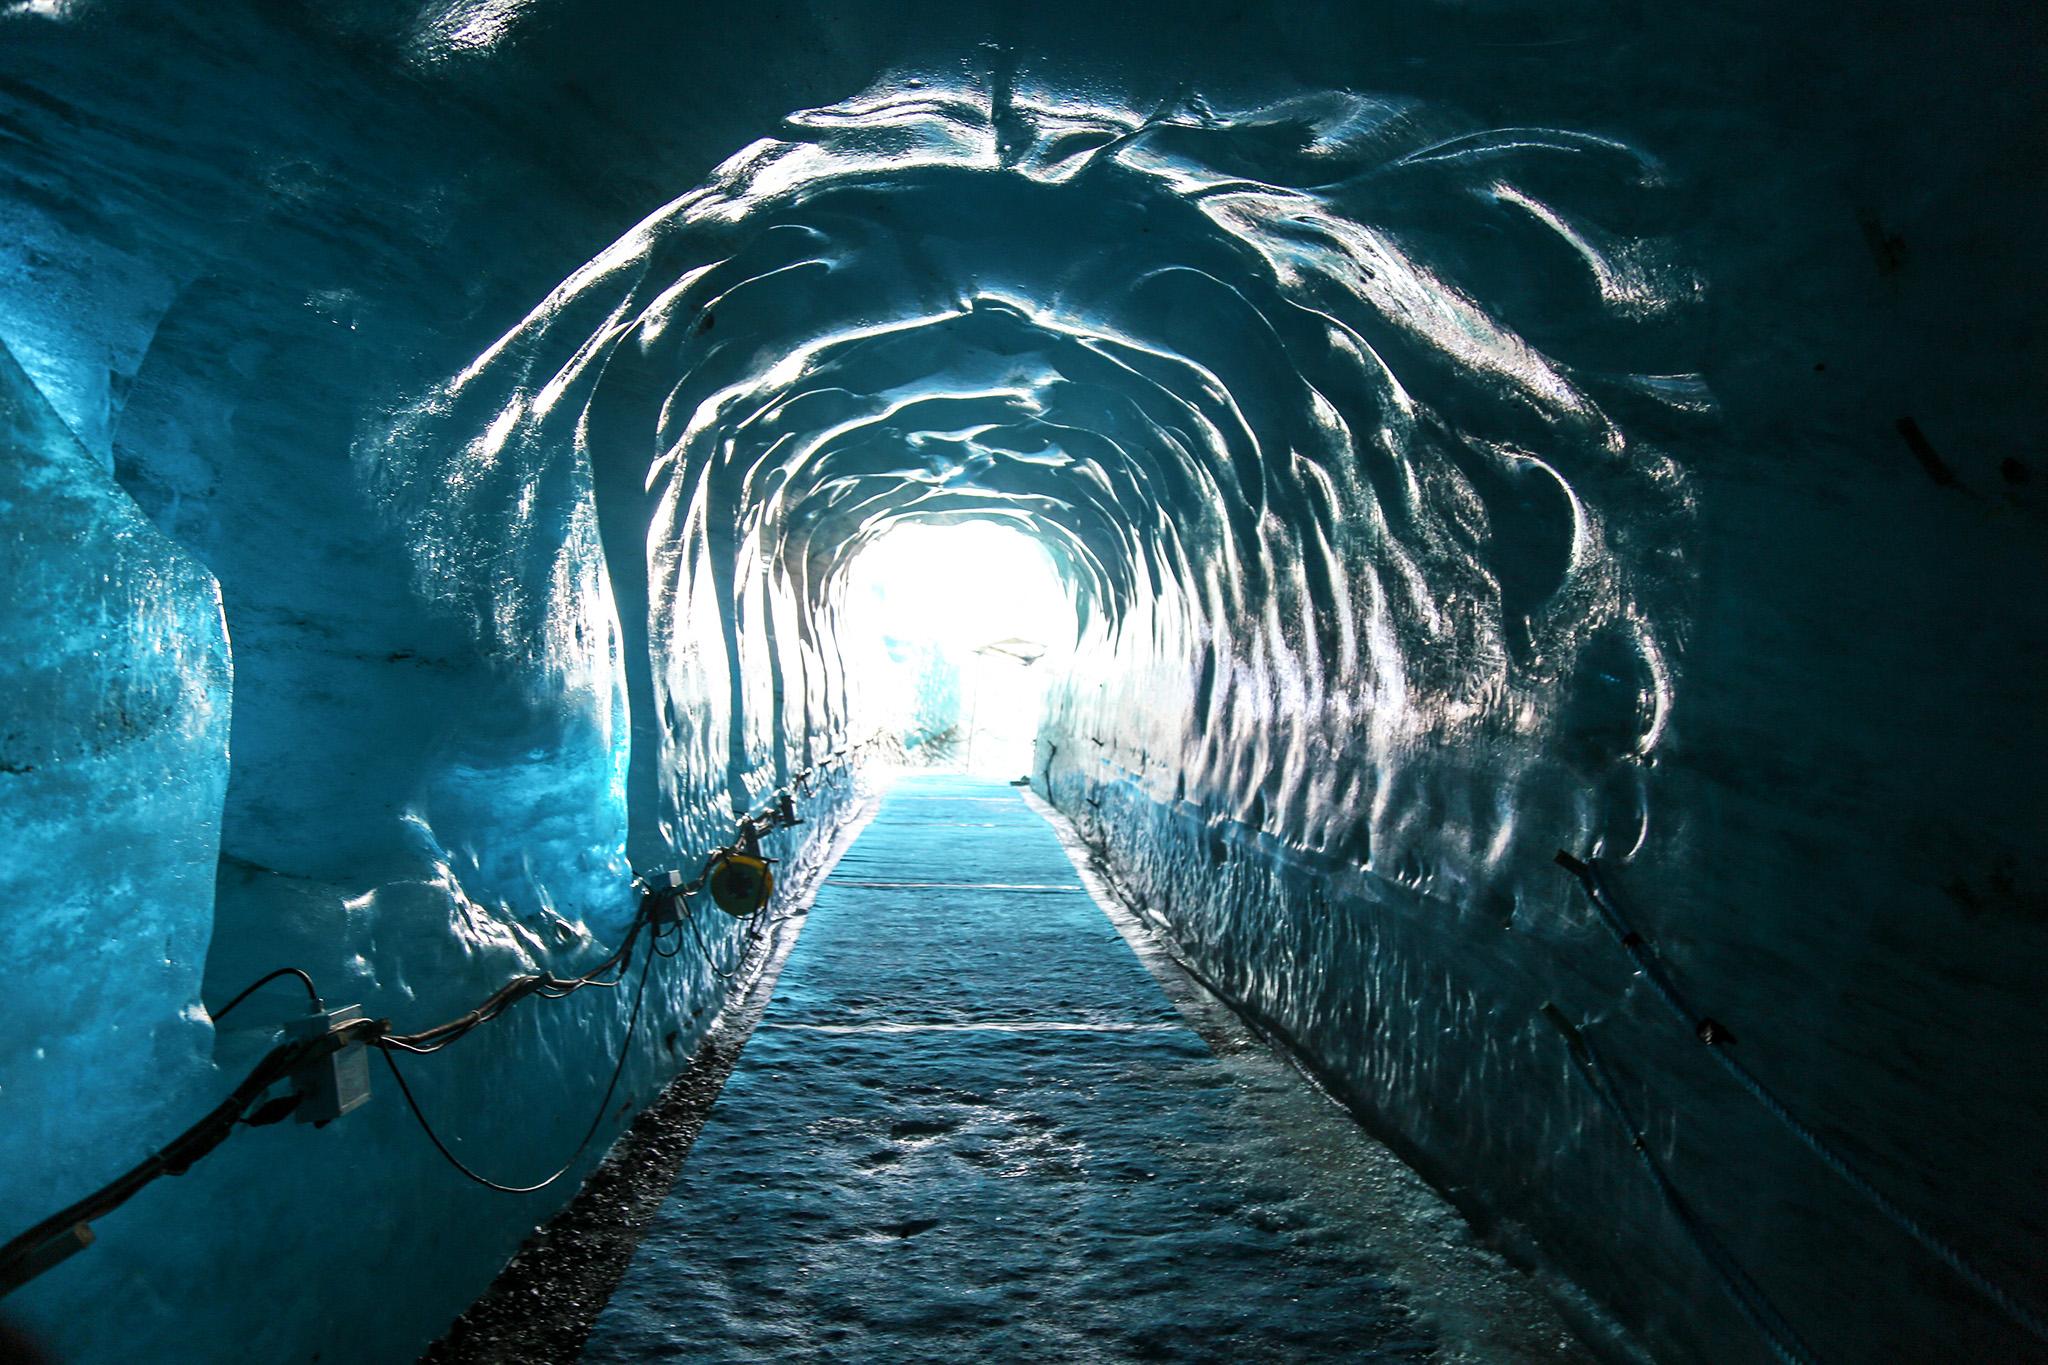 kt_2020_100_keytours_excursions_swisstours_chamonix_mont-blanc_mer_de_glace5_2048_10